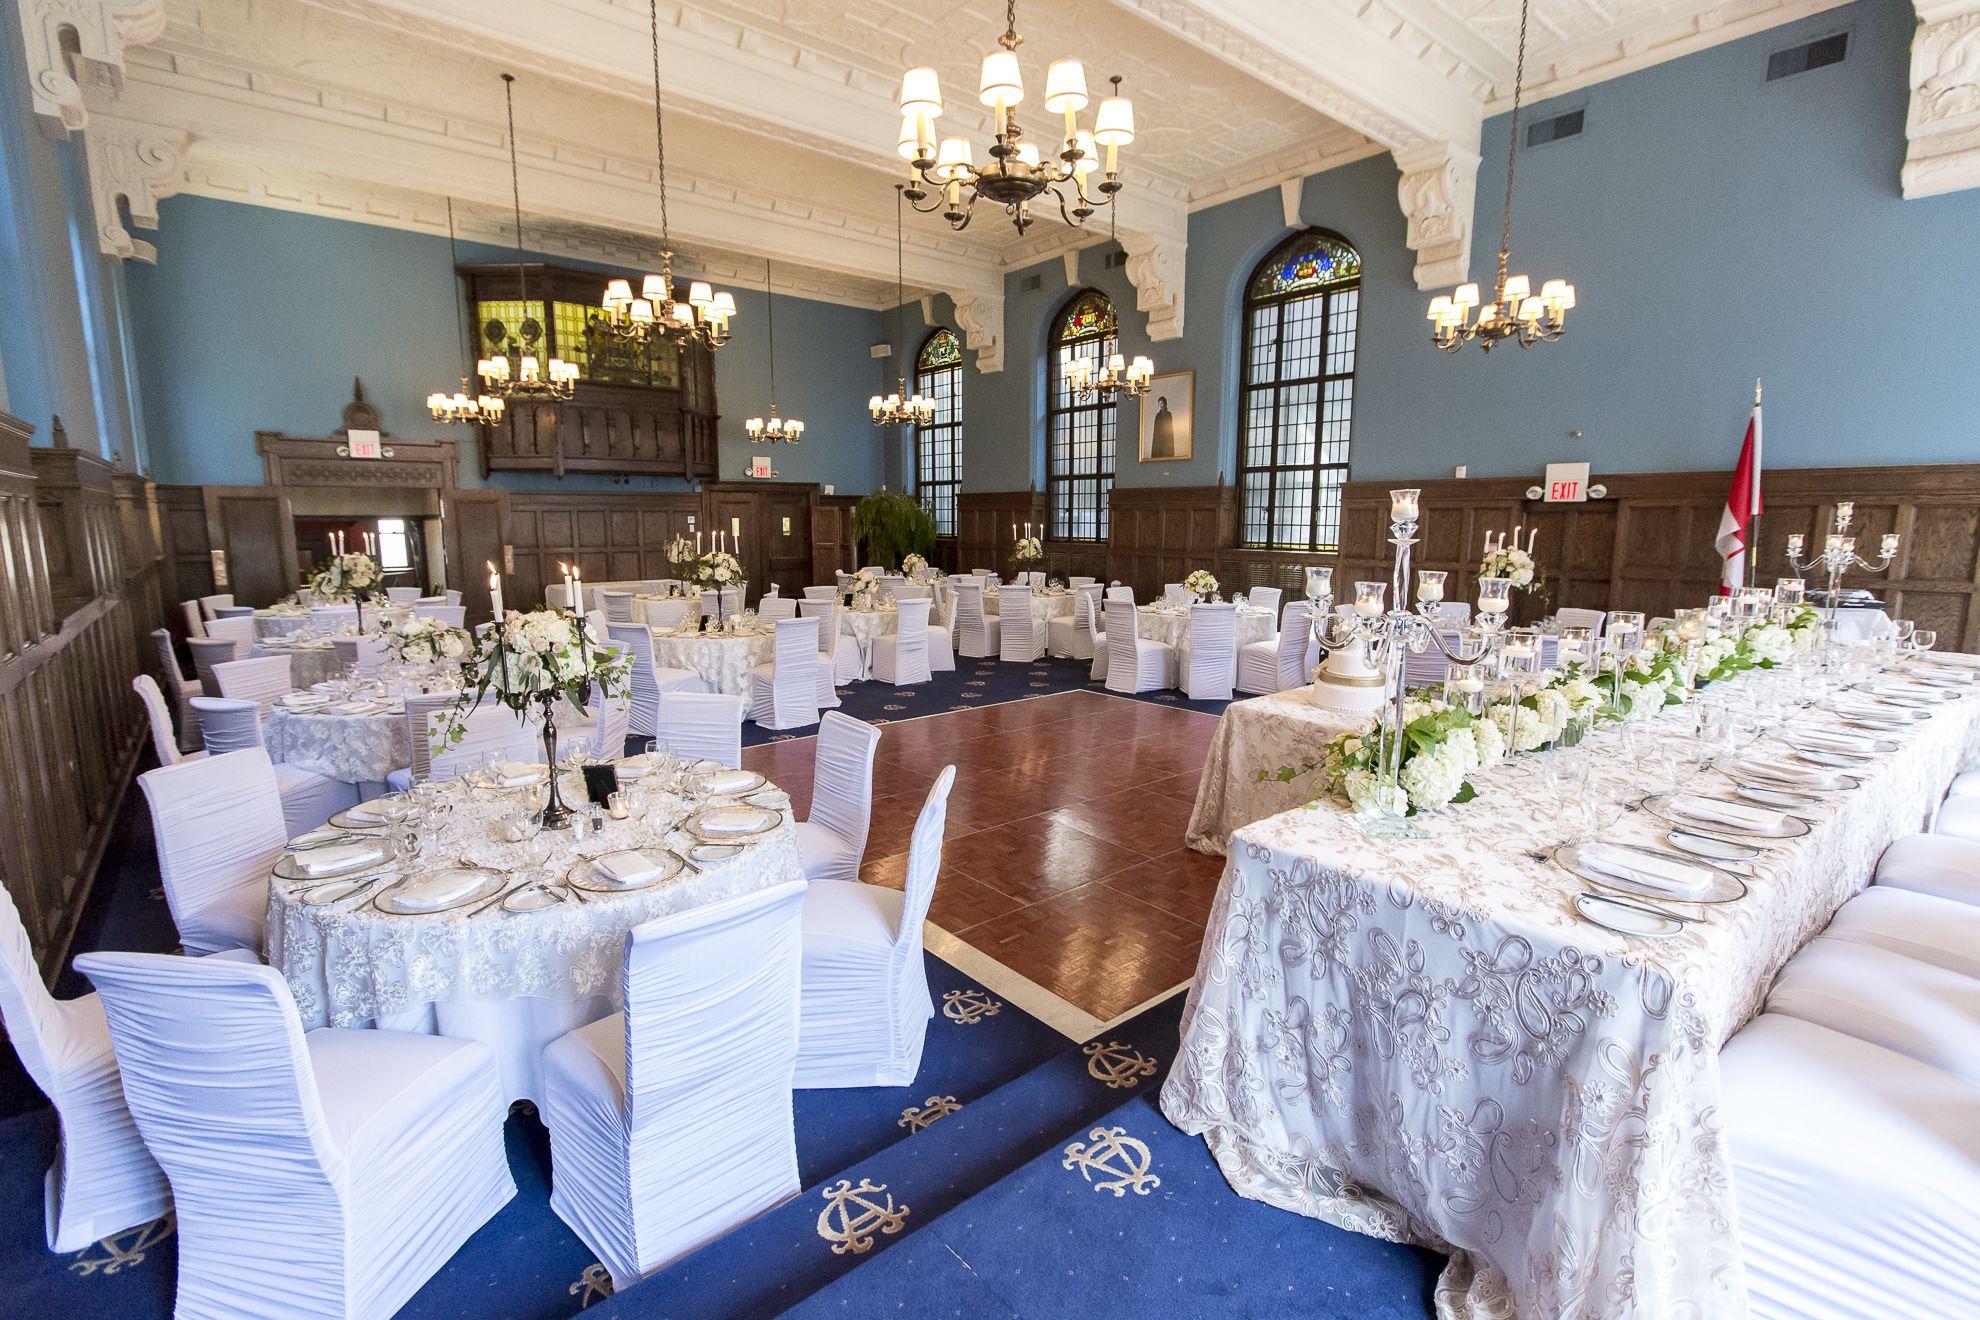 12 Toronto Wedding Venues That Won't Break the Bank ...